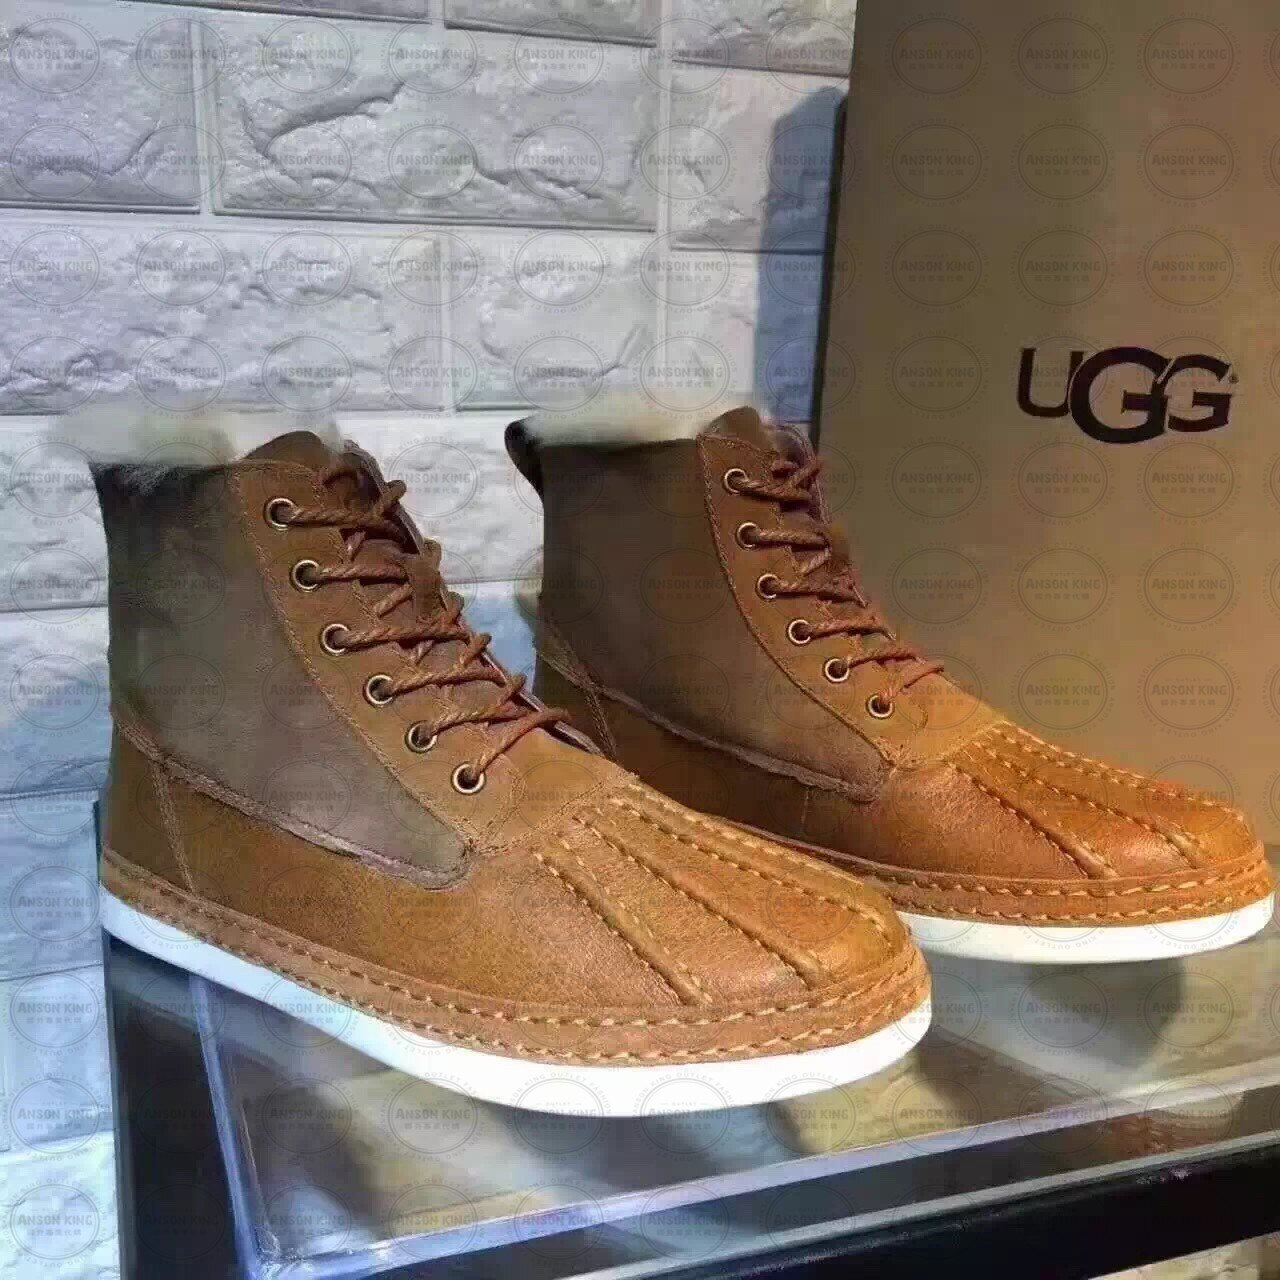 OUTLET正品代購 澳洲 UGG 冬季男款貝殼頭馬丁靴 短靴 保暖 真皮羊皮毛 雪靴 短靴 栗色 2